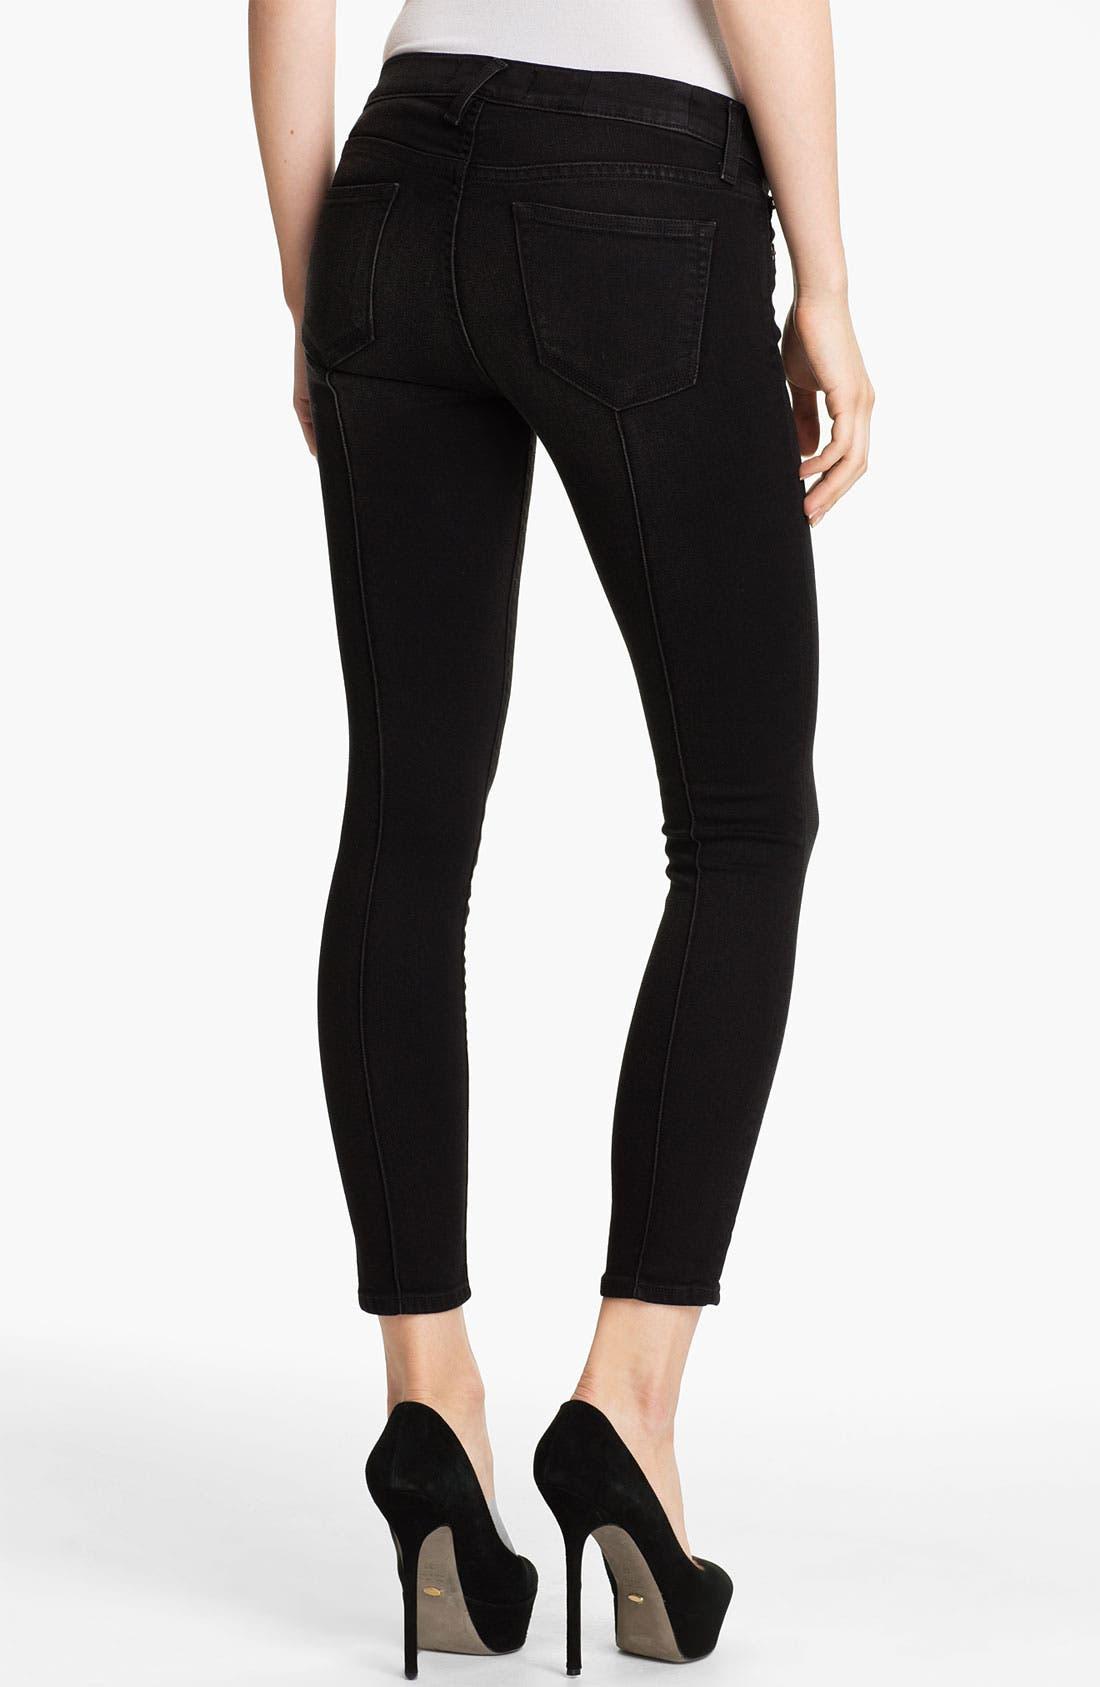 Main Image - TEXTILE Elizabeth and James 'Benny' Skinny Jeans